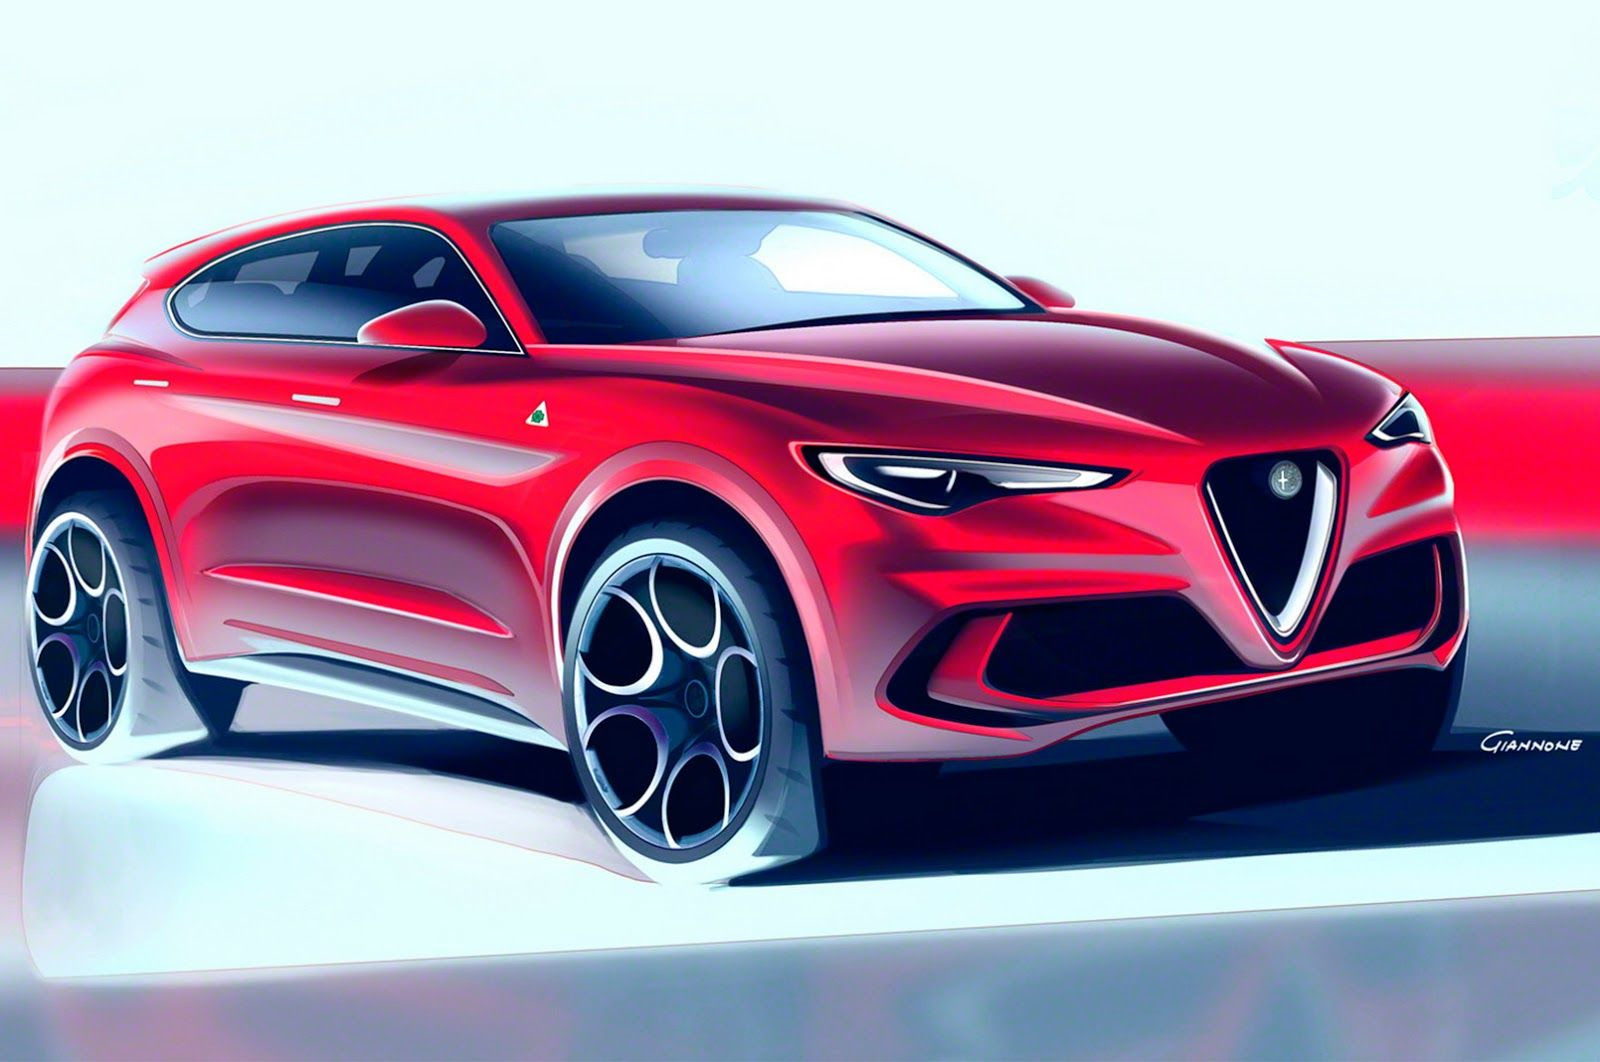 New Alfa Romeo Stelvio Suv Lands In La With Giulia Styling Carscoops Alfa Romeo Stelvio Alfa Romeo Automotive Design